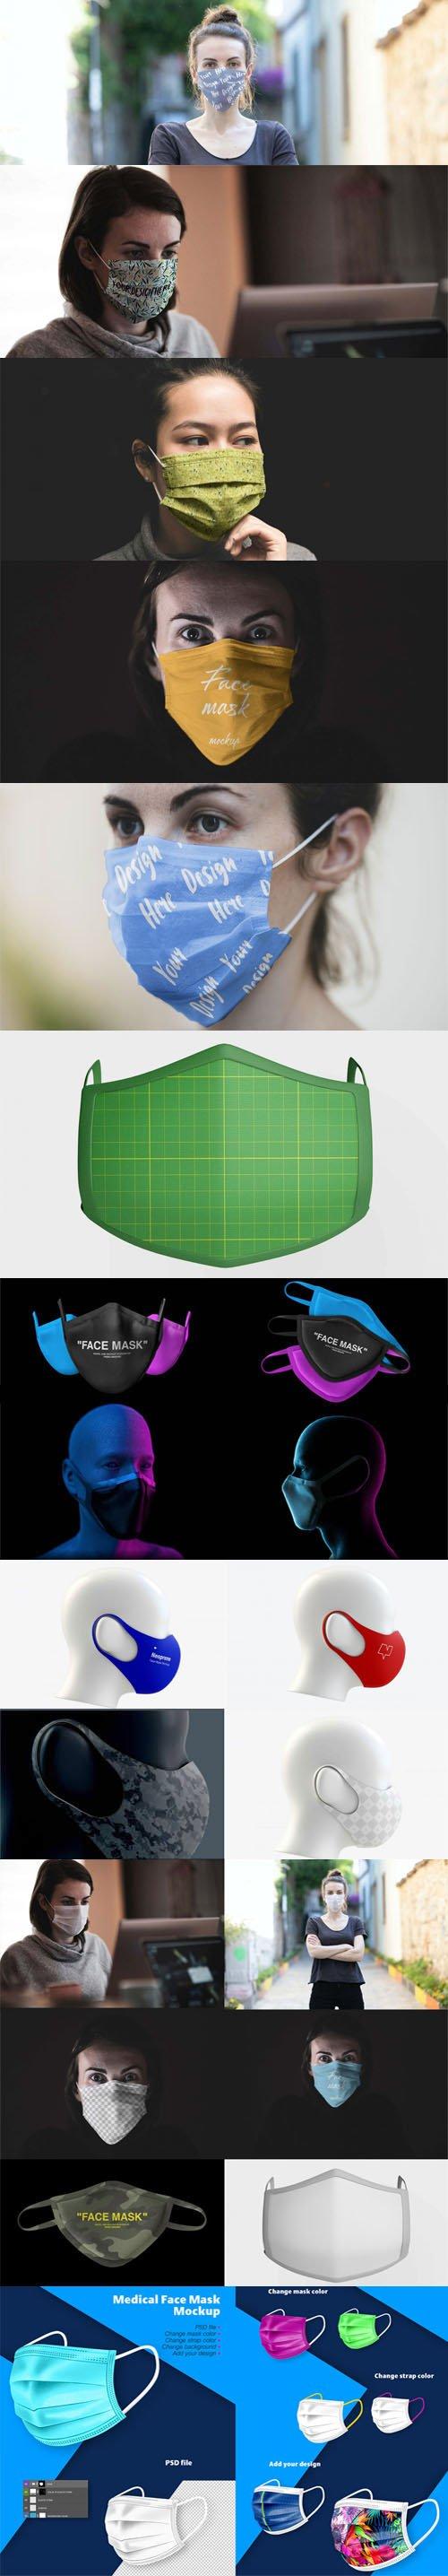 Medical Face Mask PSD Mockups Templates Collection